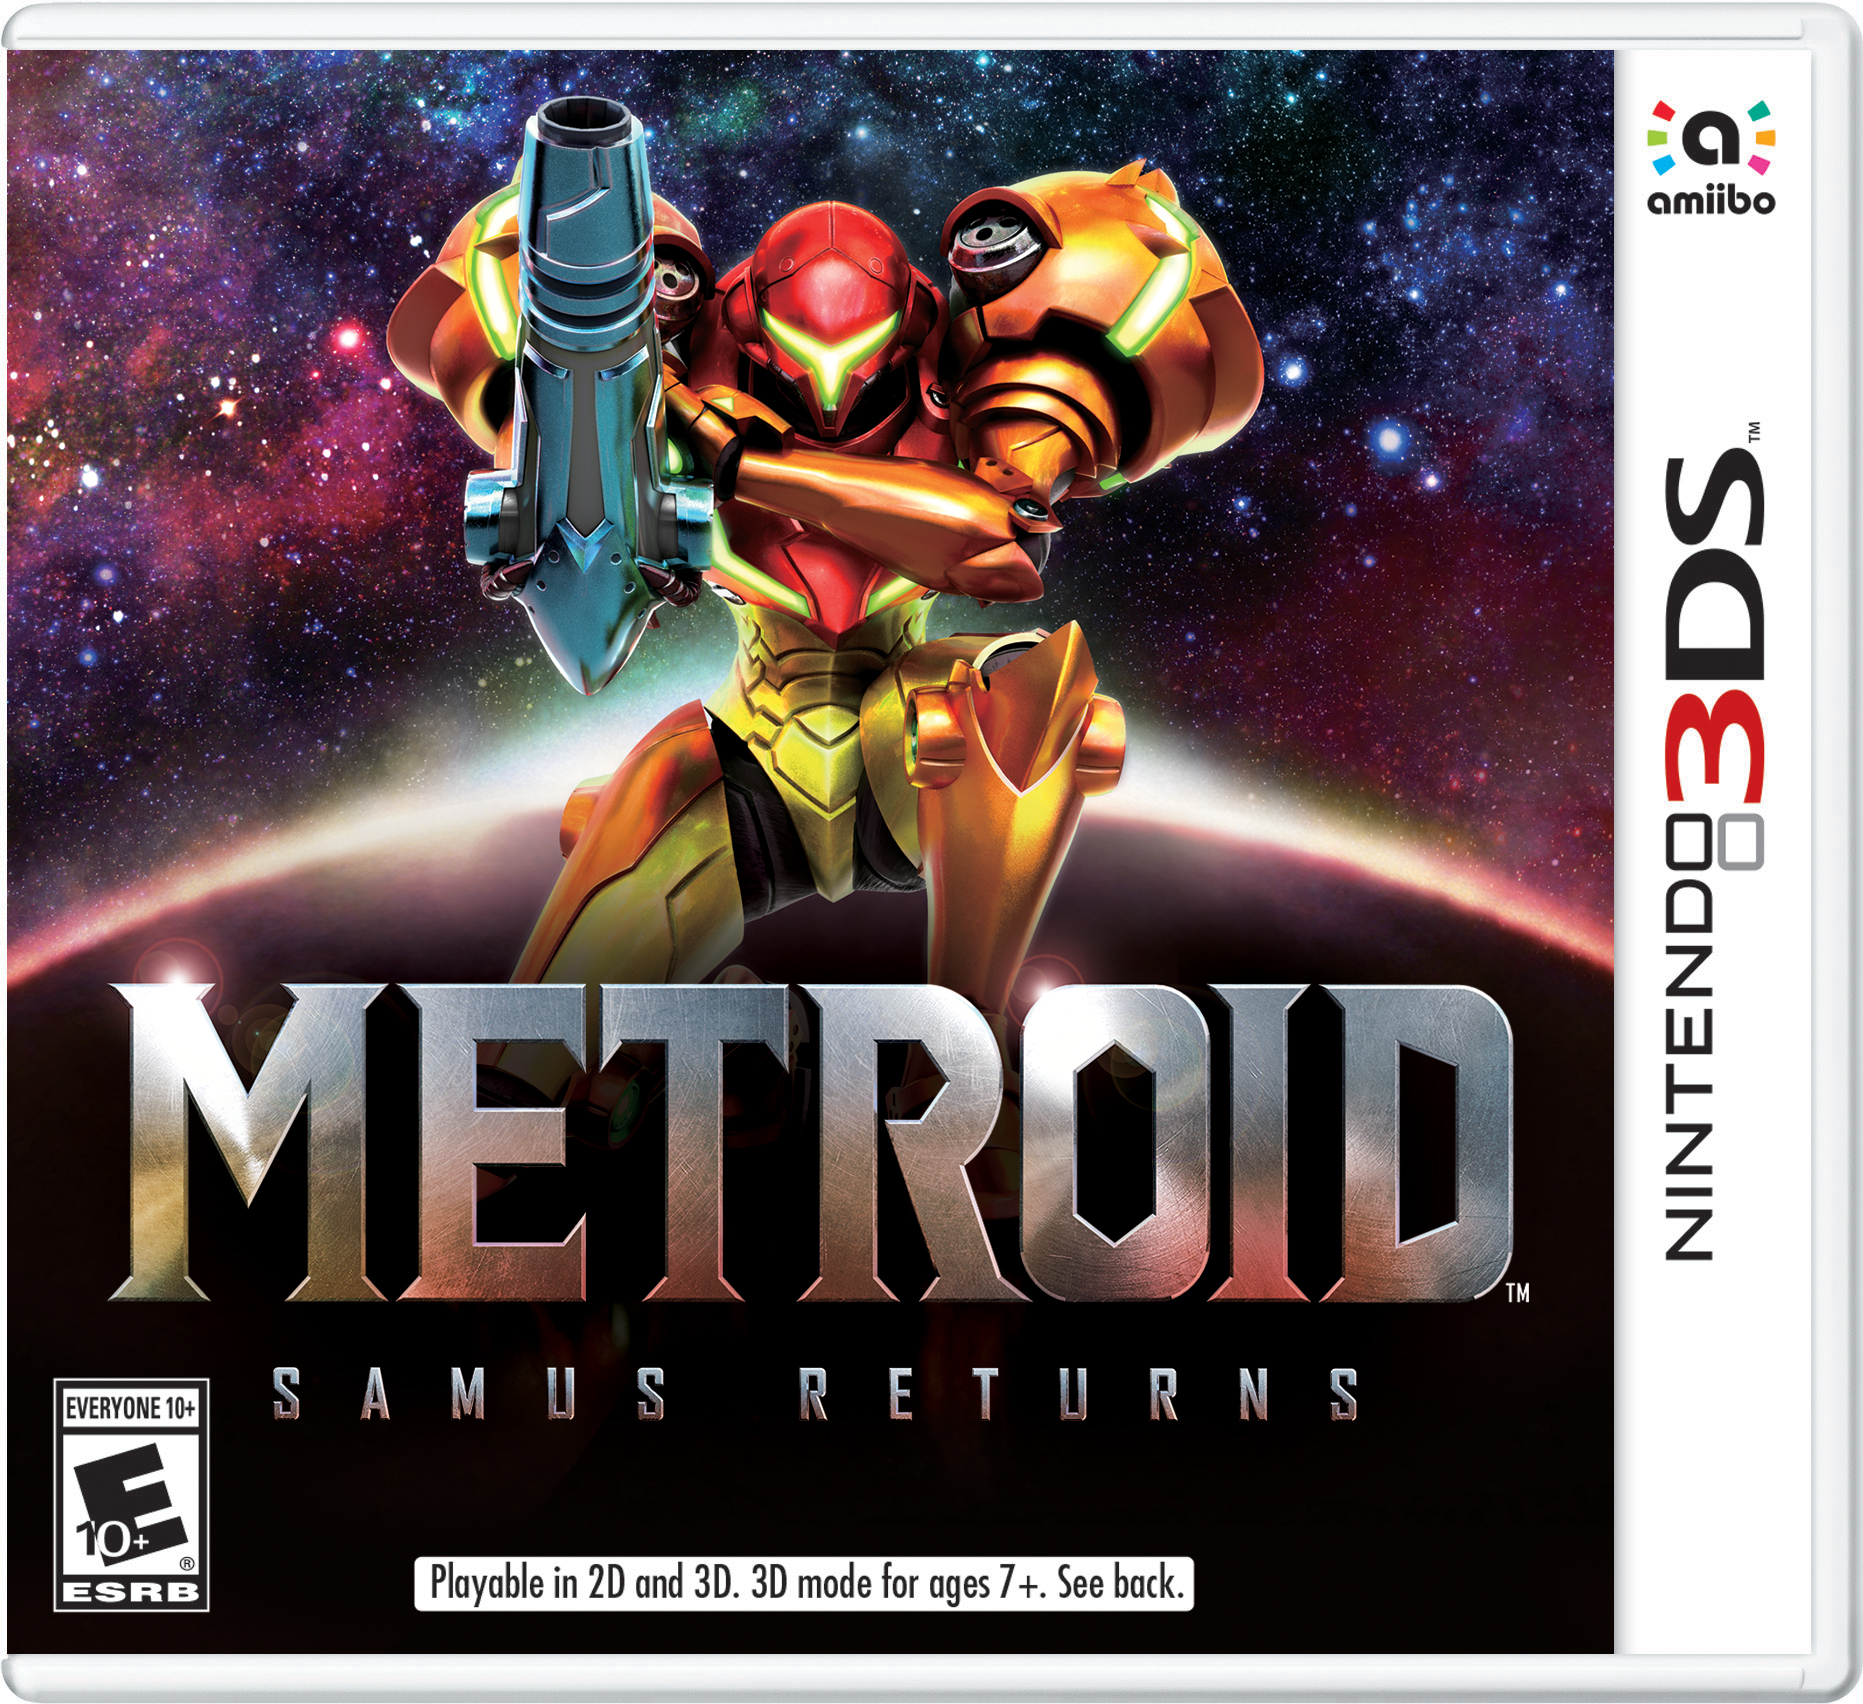 Metroid Samus Returns Box Art